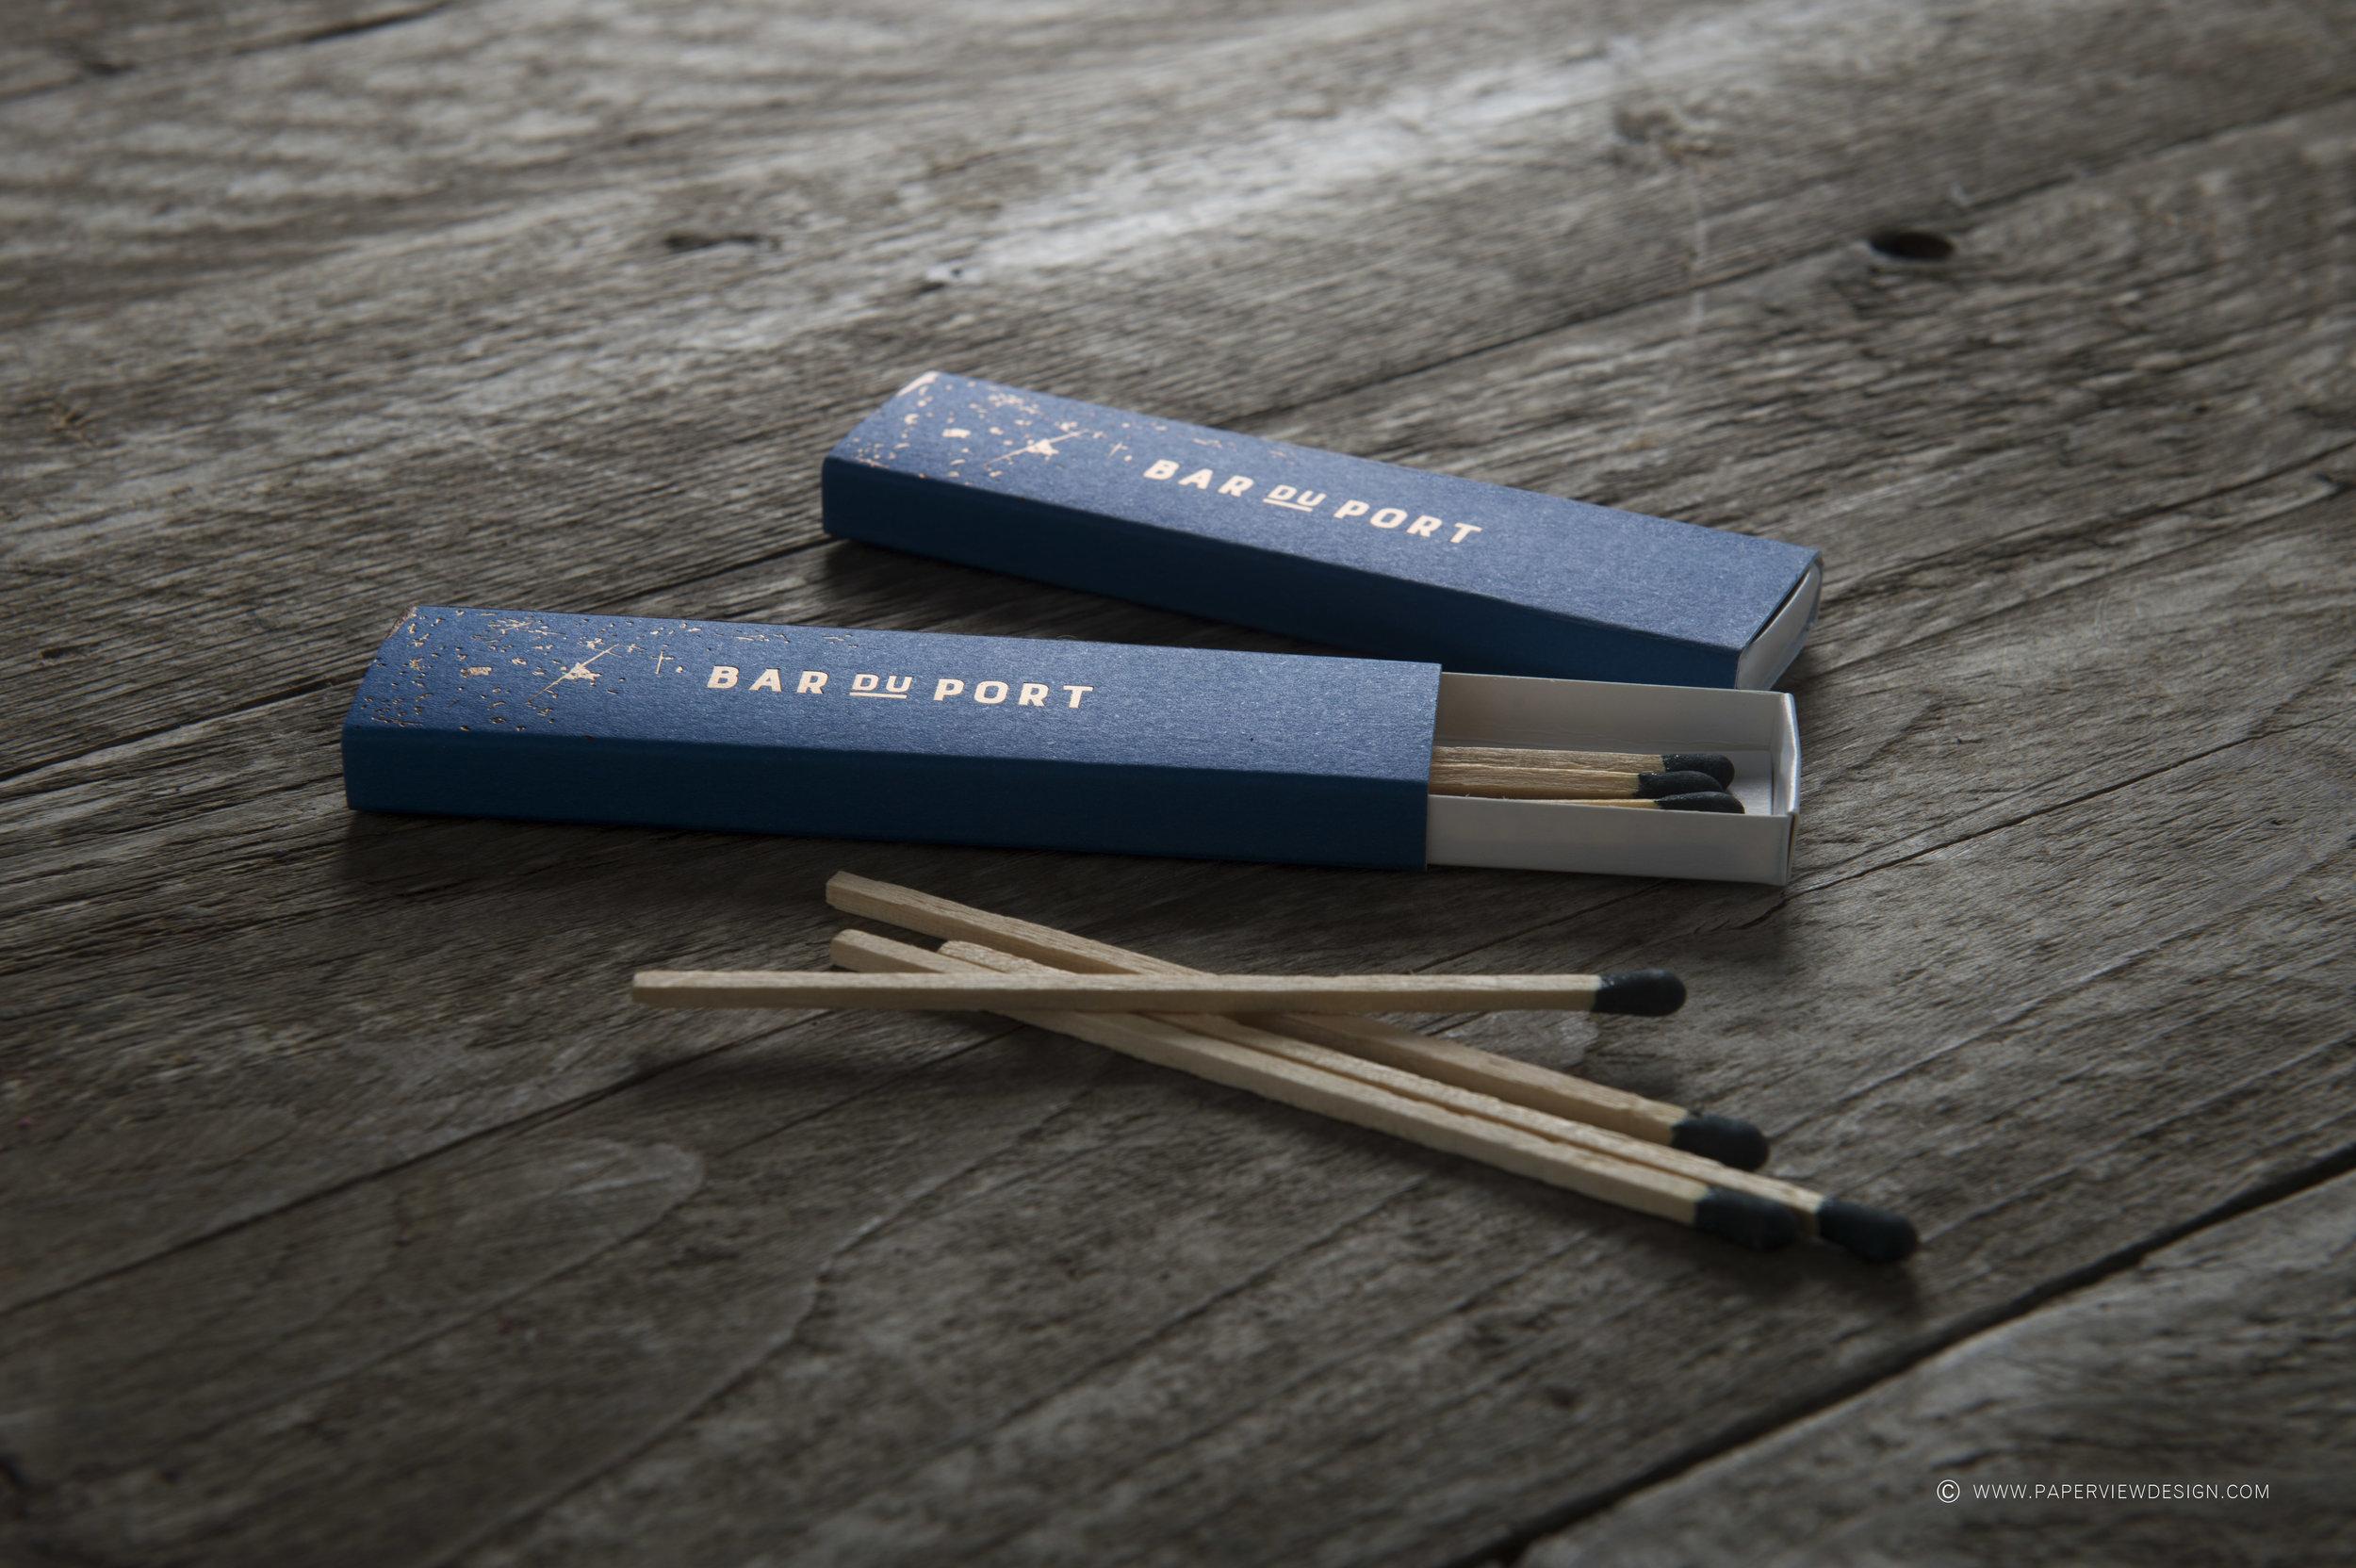 Matches-Branding-Foil-Hot-Branding-Design-Art